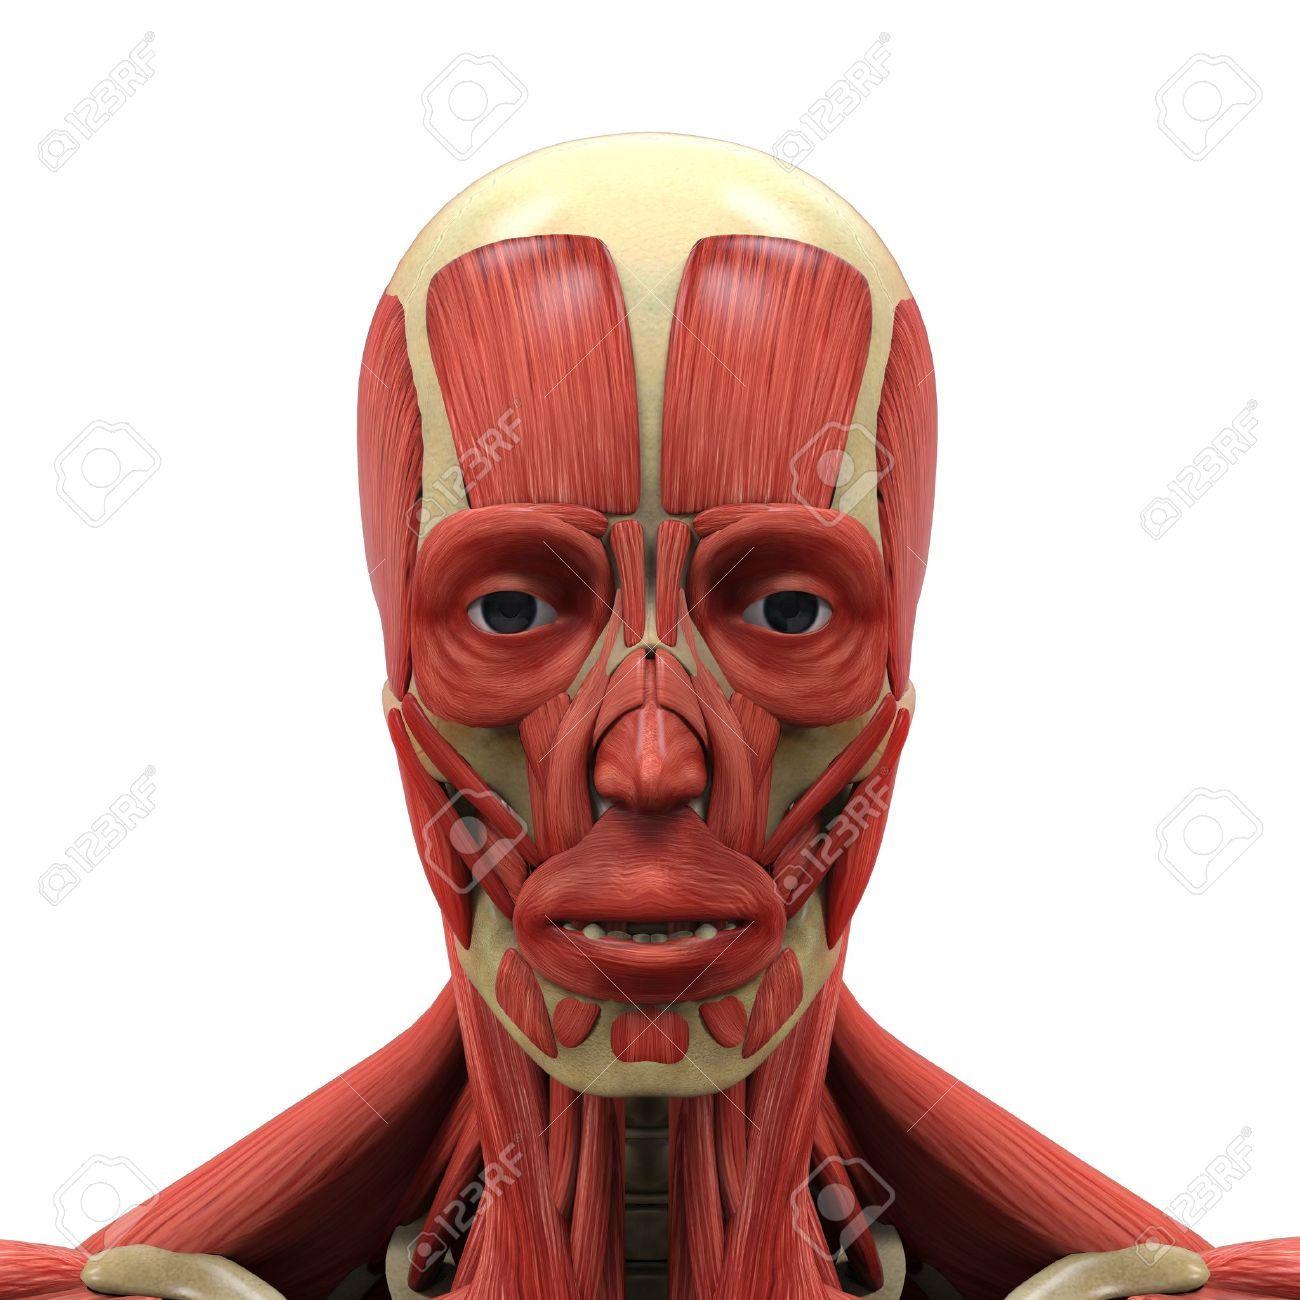 21459798-Human-Face-Anatomy-Stock-Photo-anatomy-muscle.jpg (1300 ...